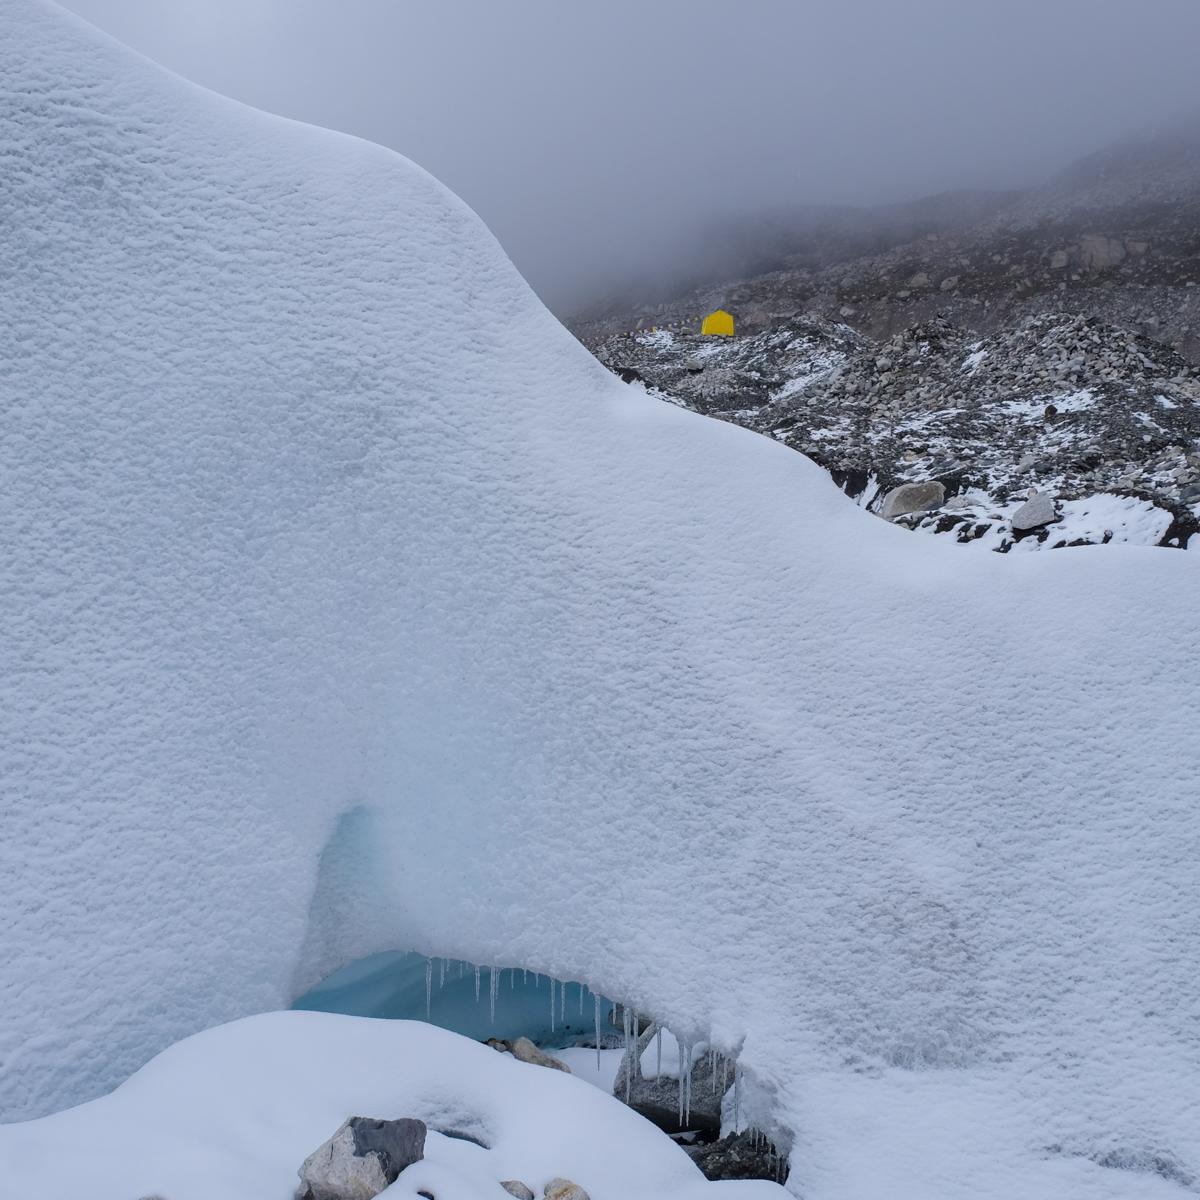 Everest Base Camp, Everest 3 pass #2 40